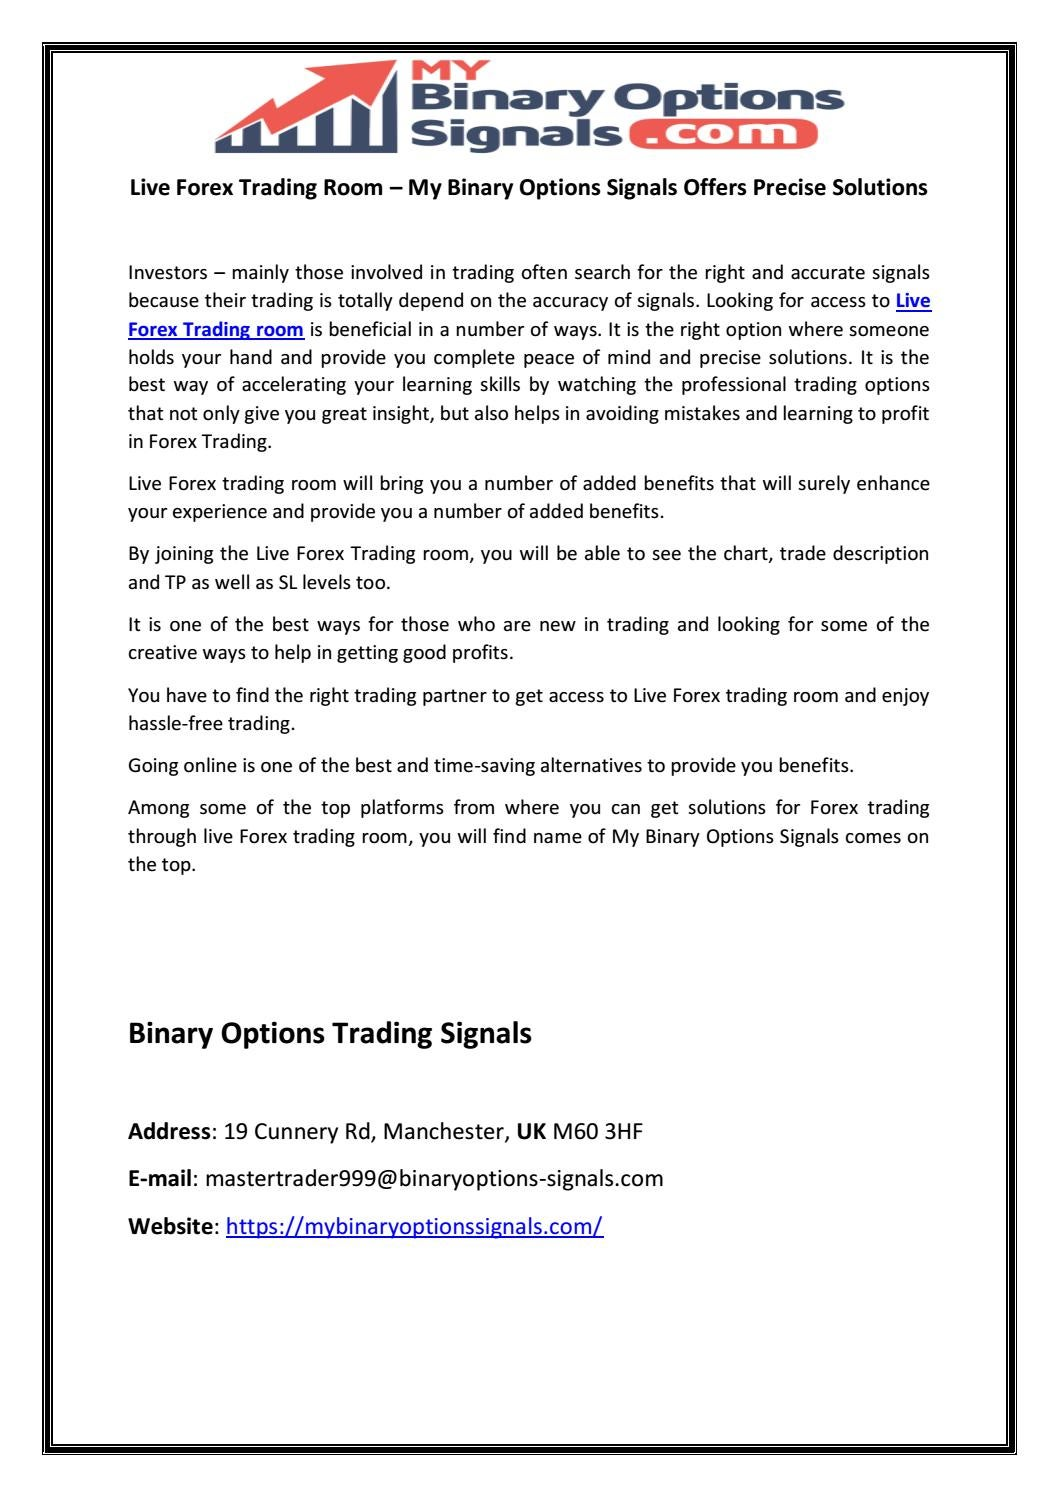 Live binary options trading room marketing communications director at ladbrokes betting